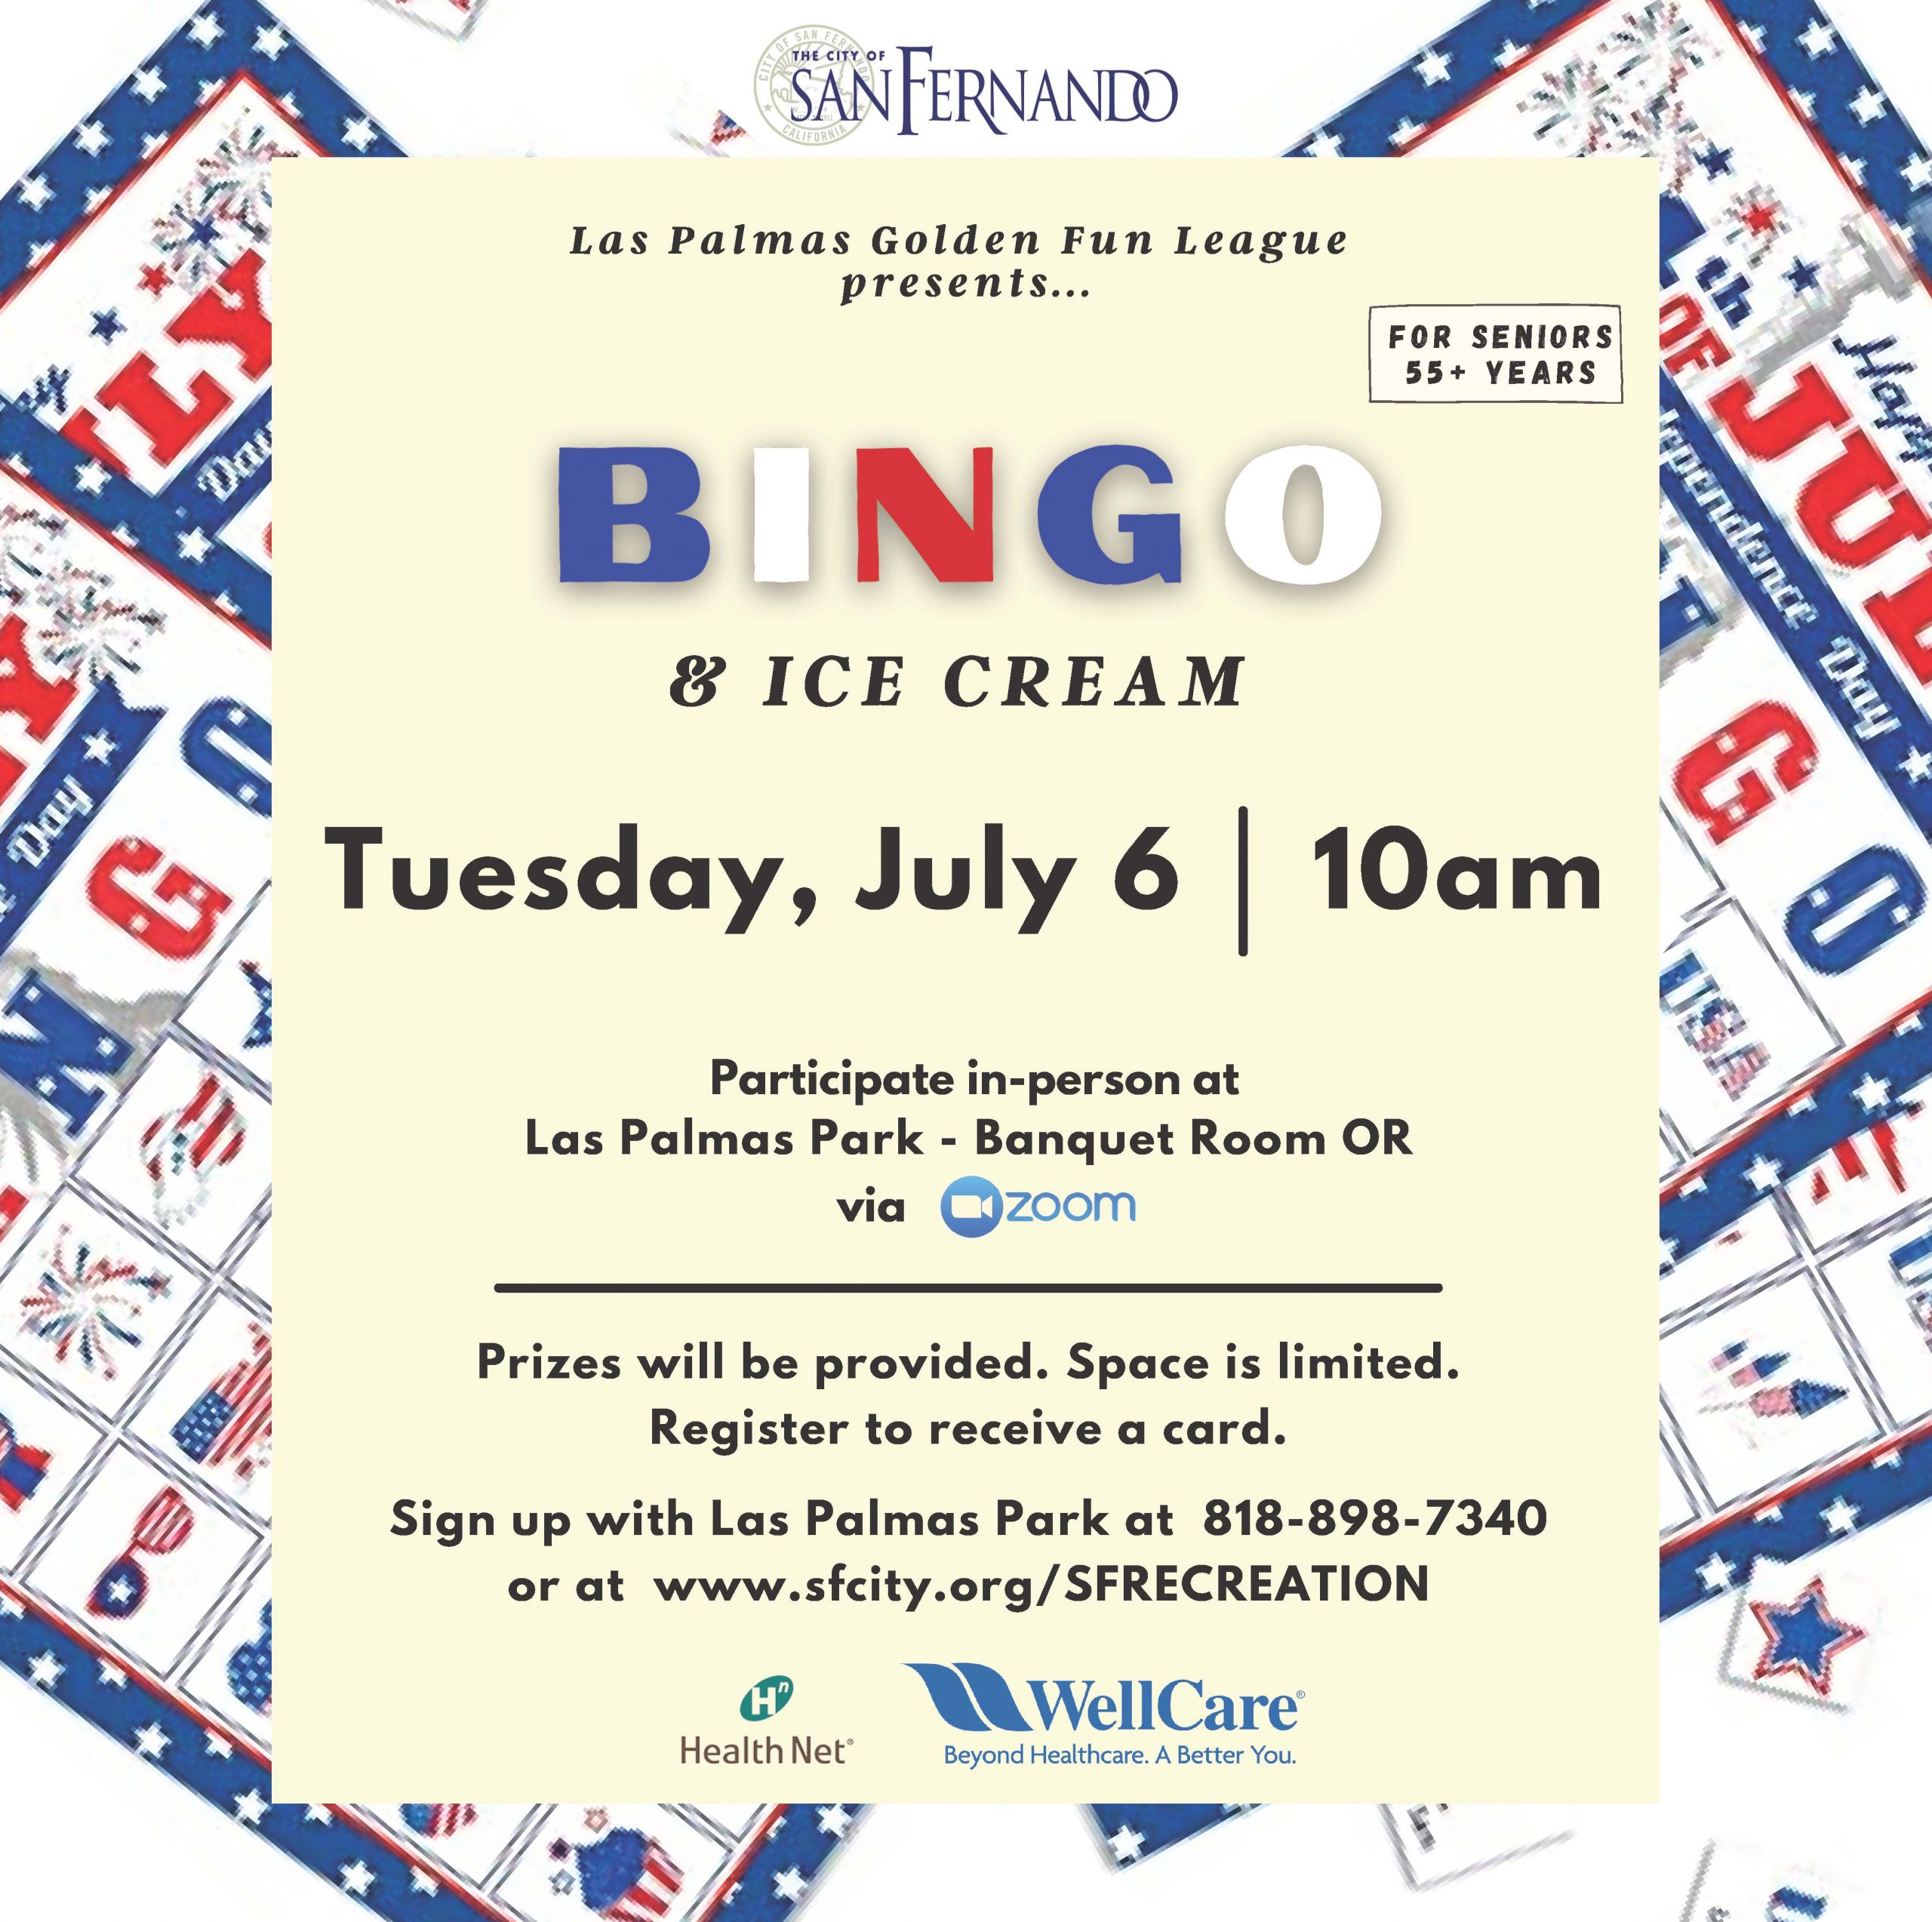 Bingo and ice cream with Healthnet